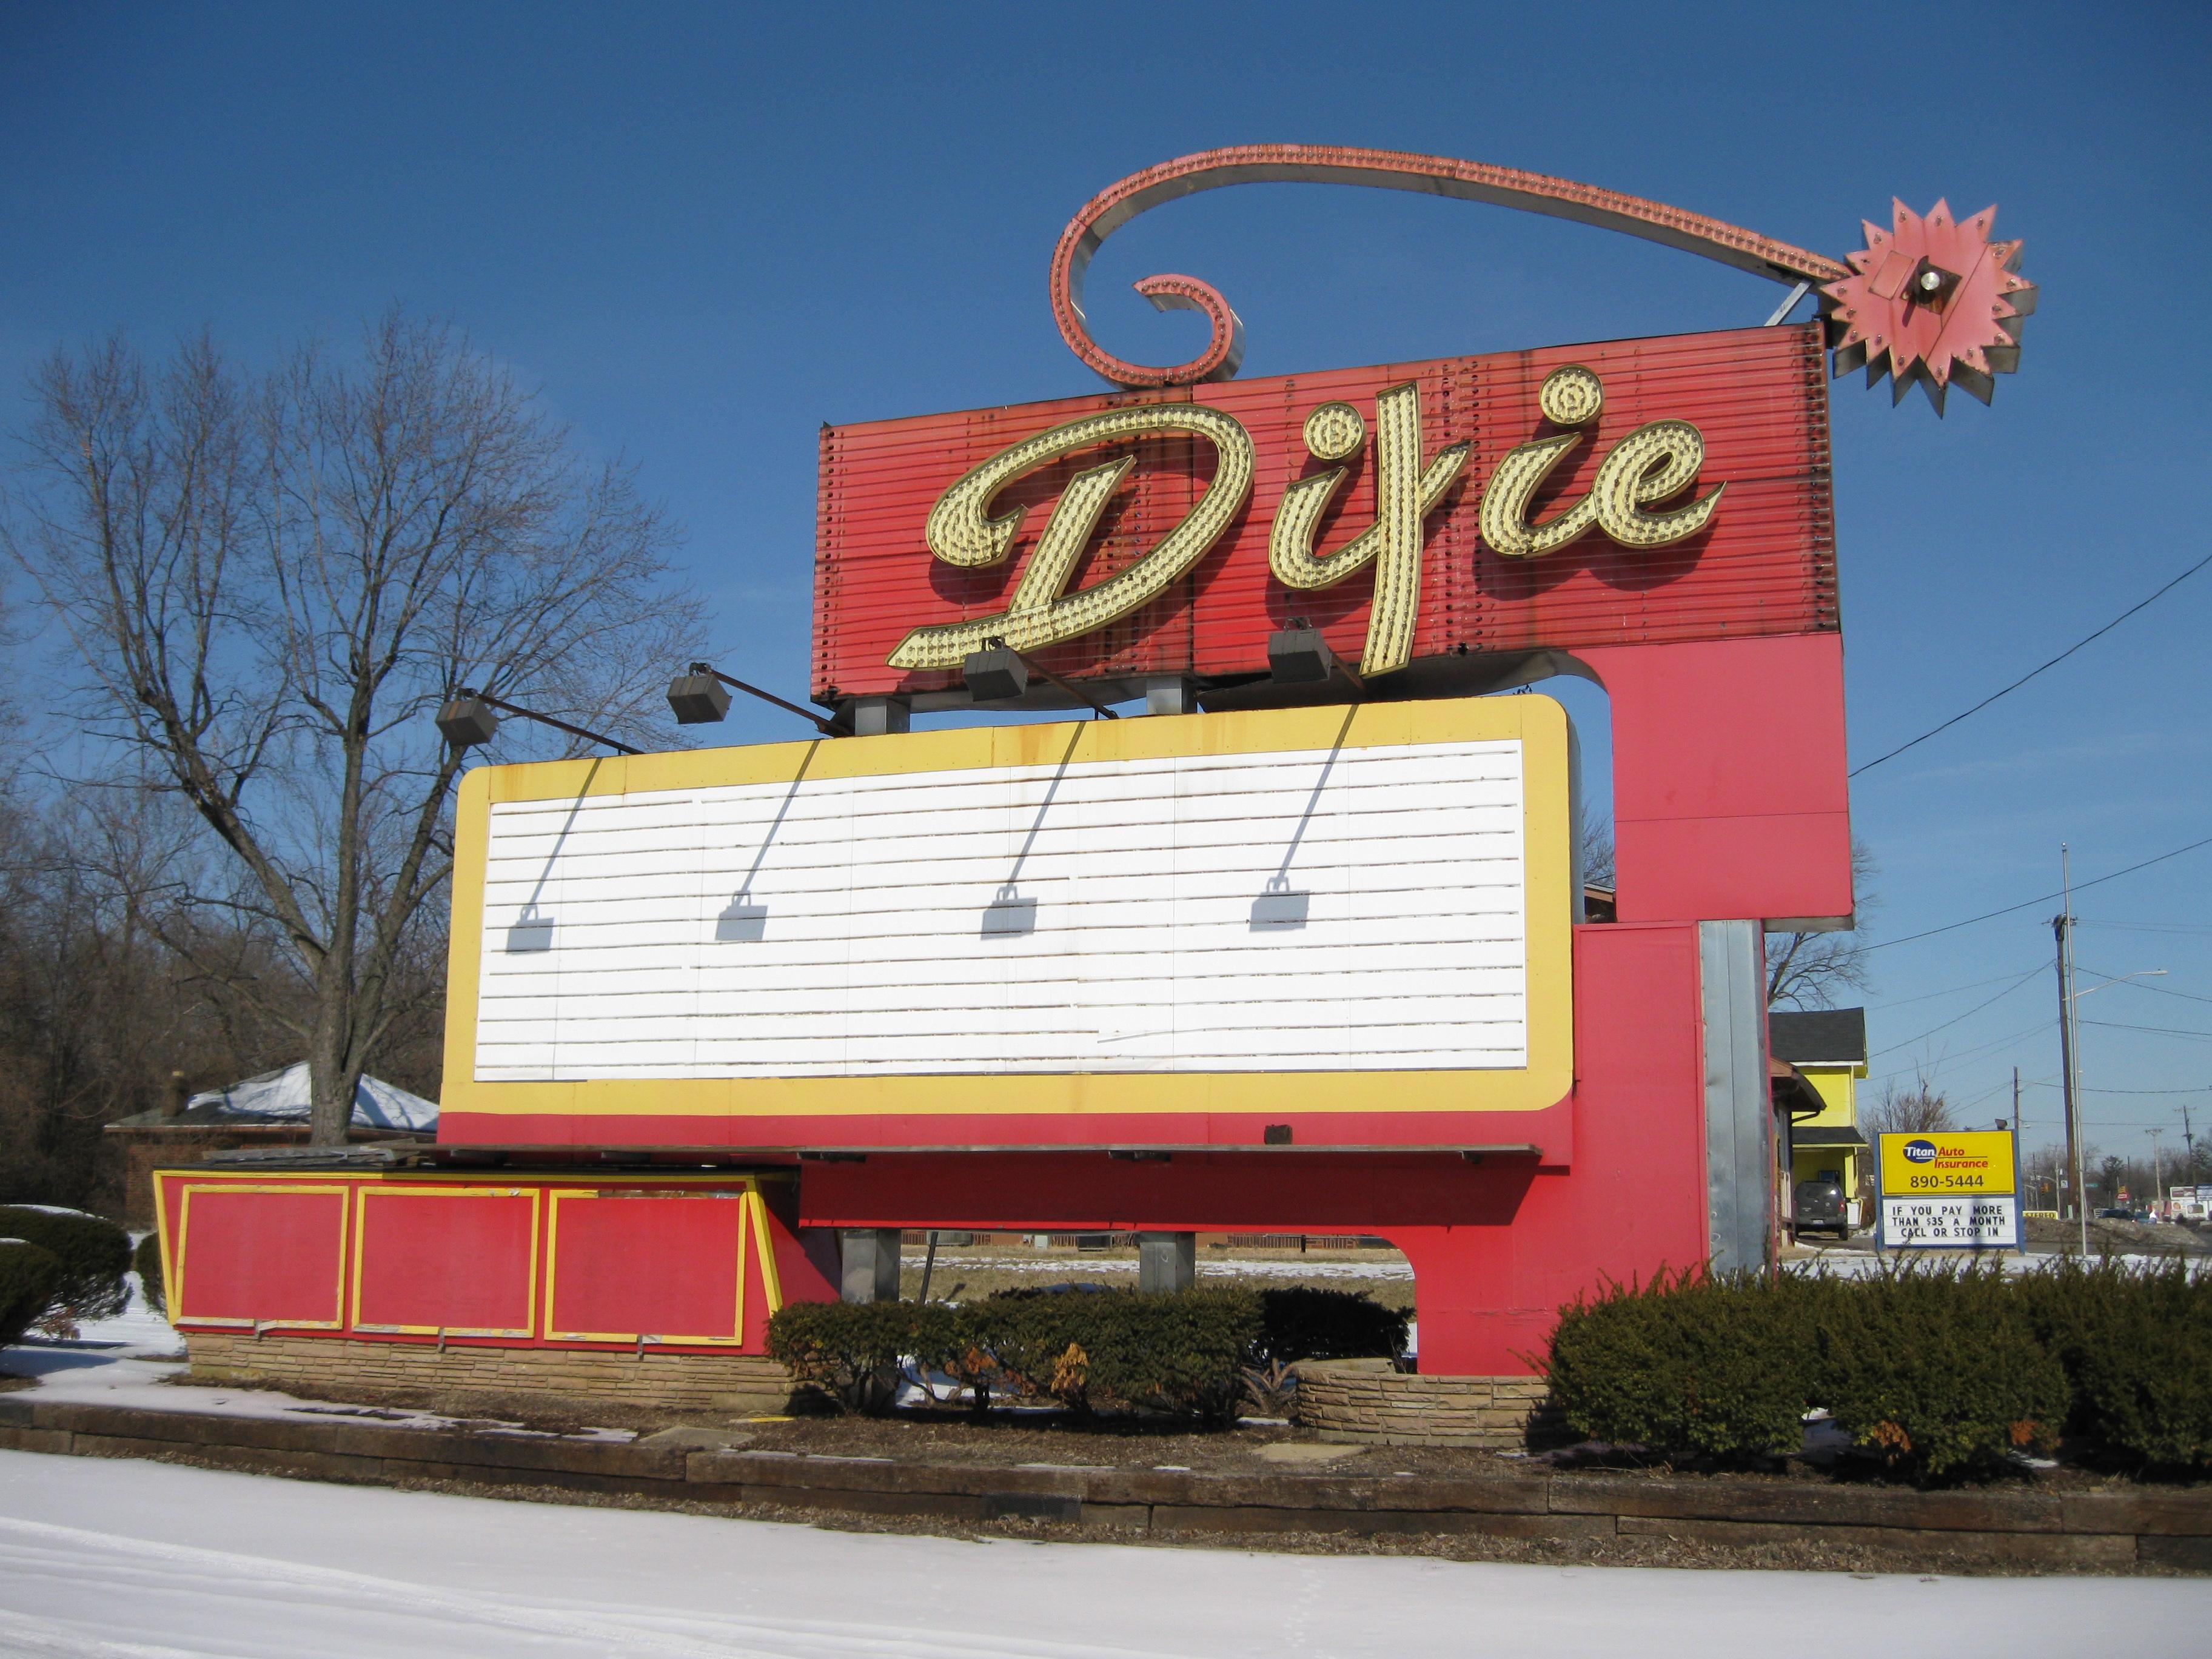 Dixie Twin Drive-In - 6201 North Dixie Drive, Dayton, Ohio U.S.A. - February 6, 2009